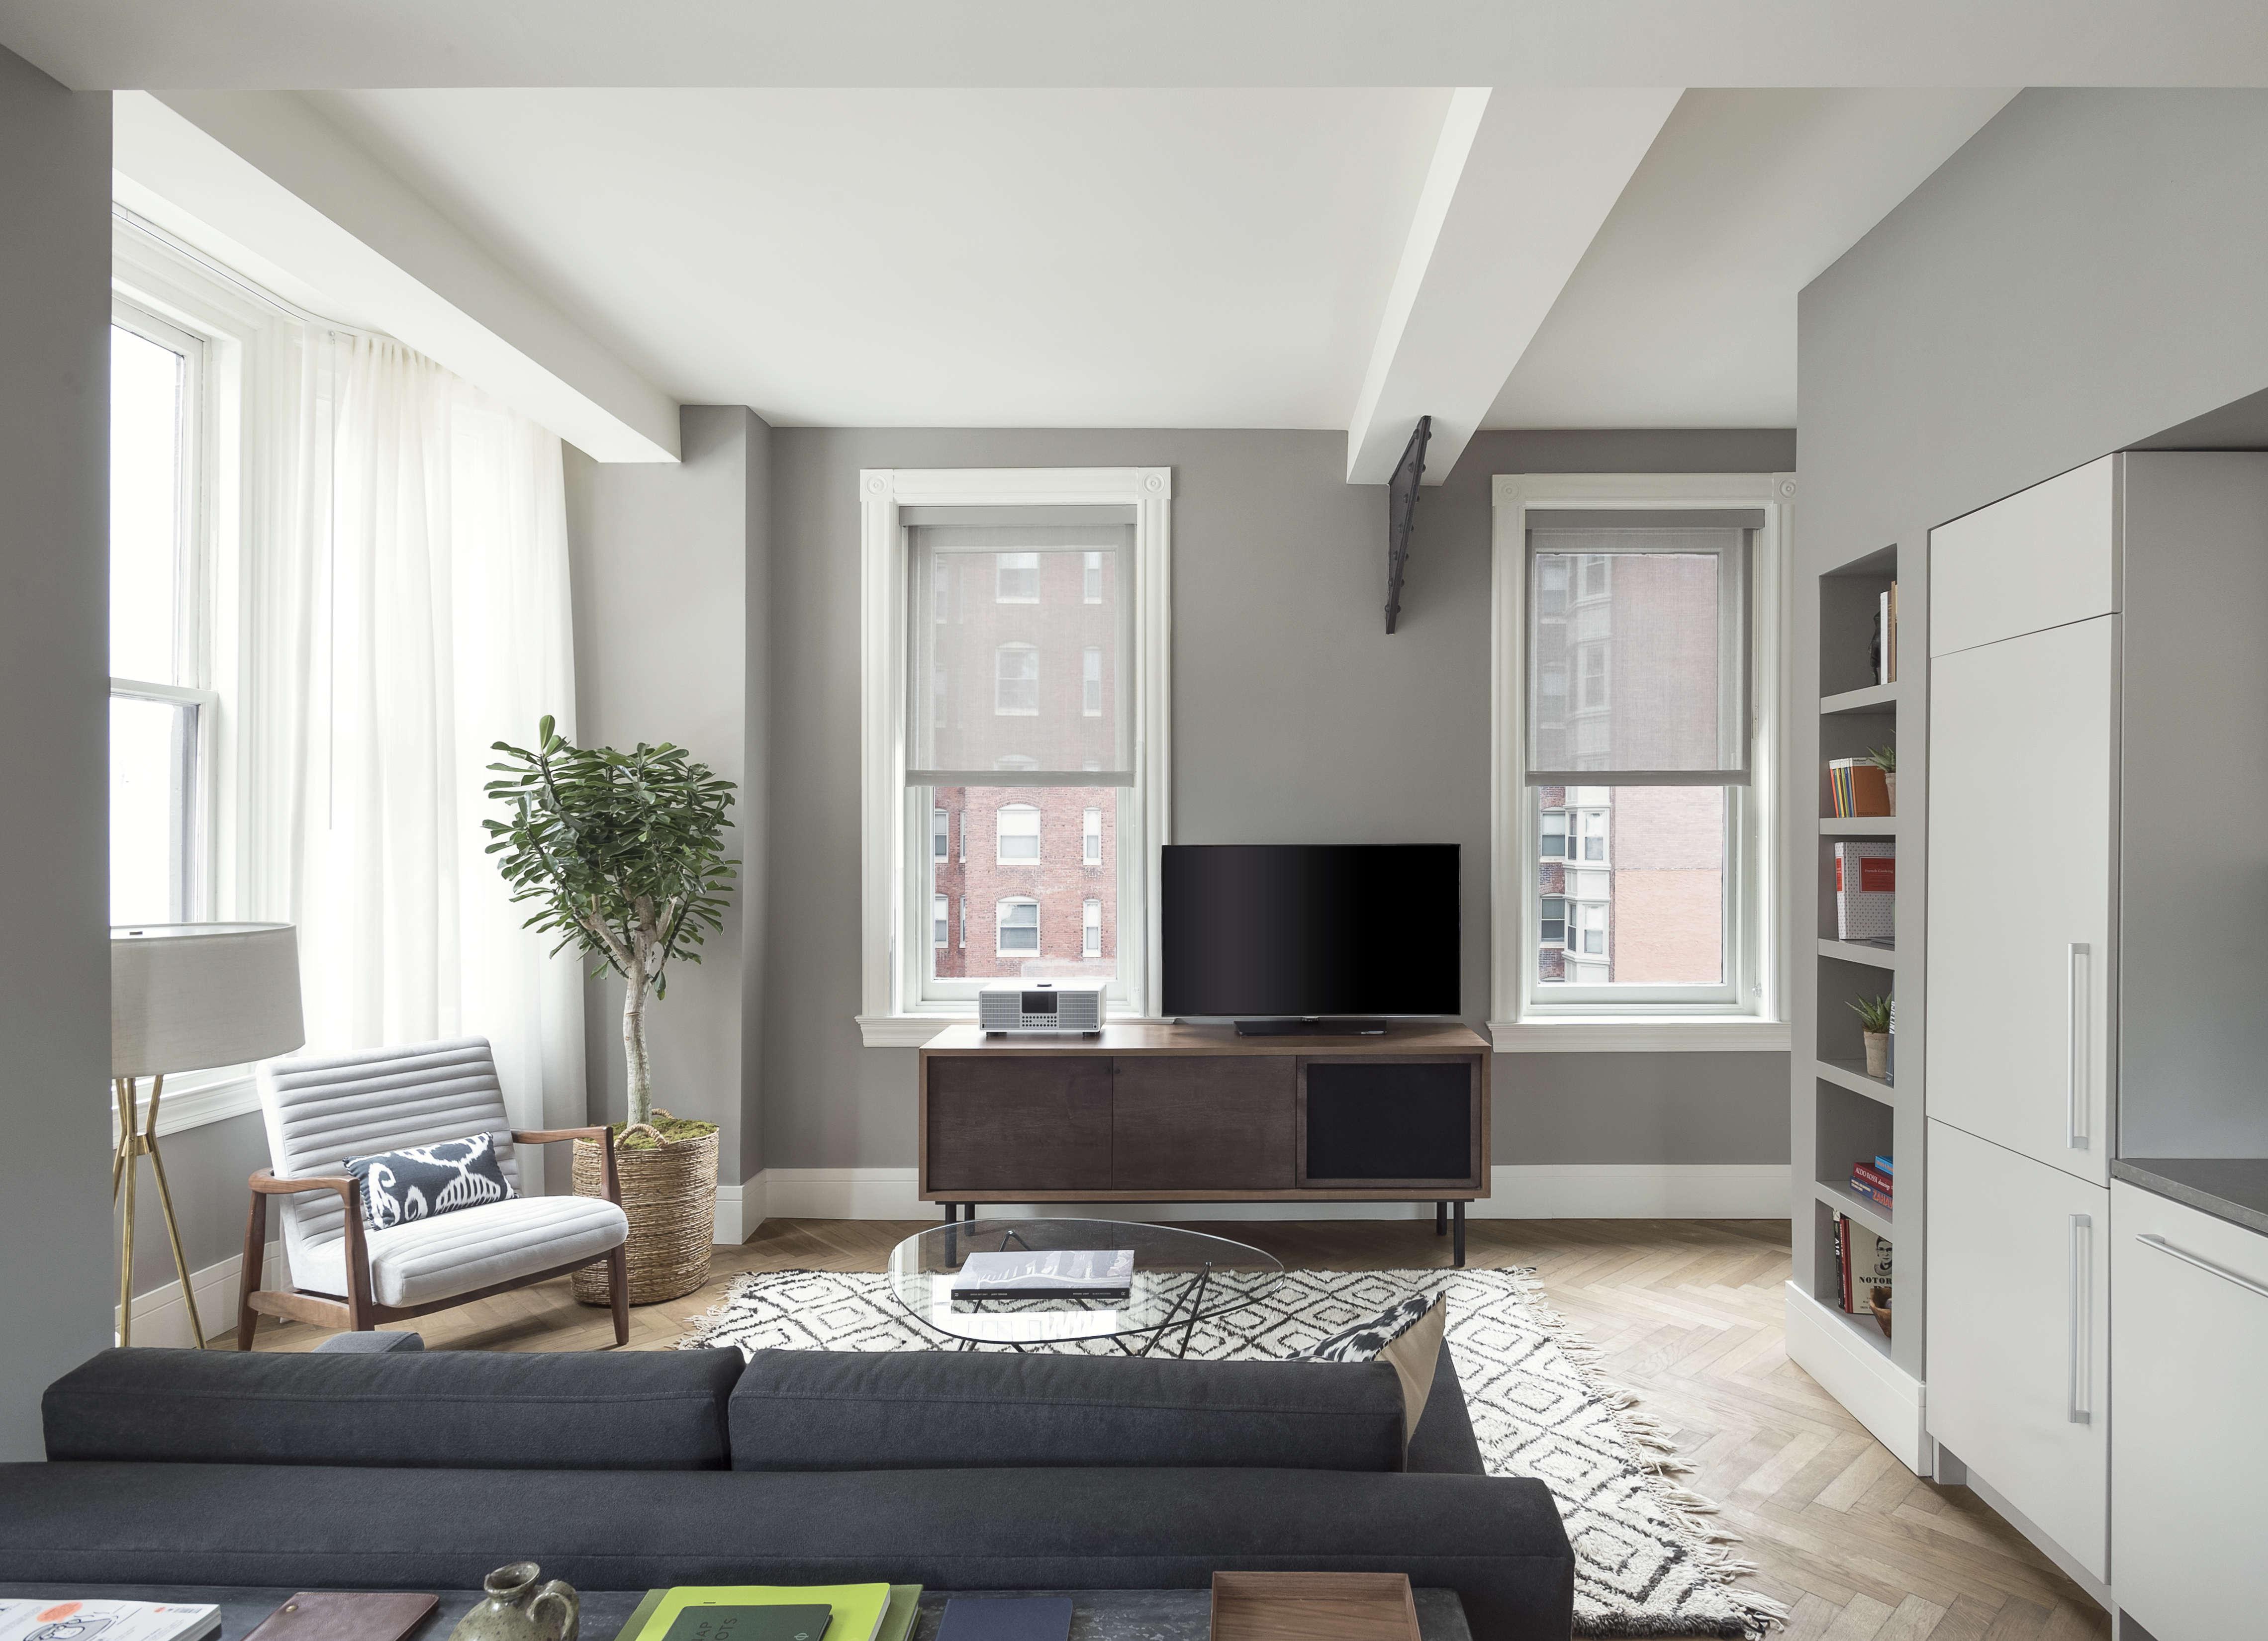 roost living room remodelista 10 15